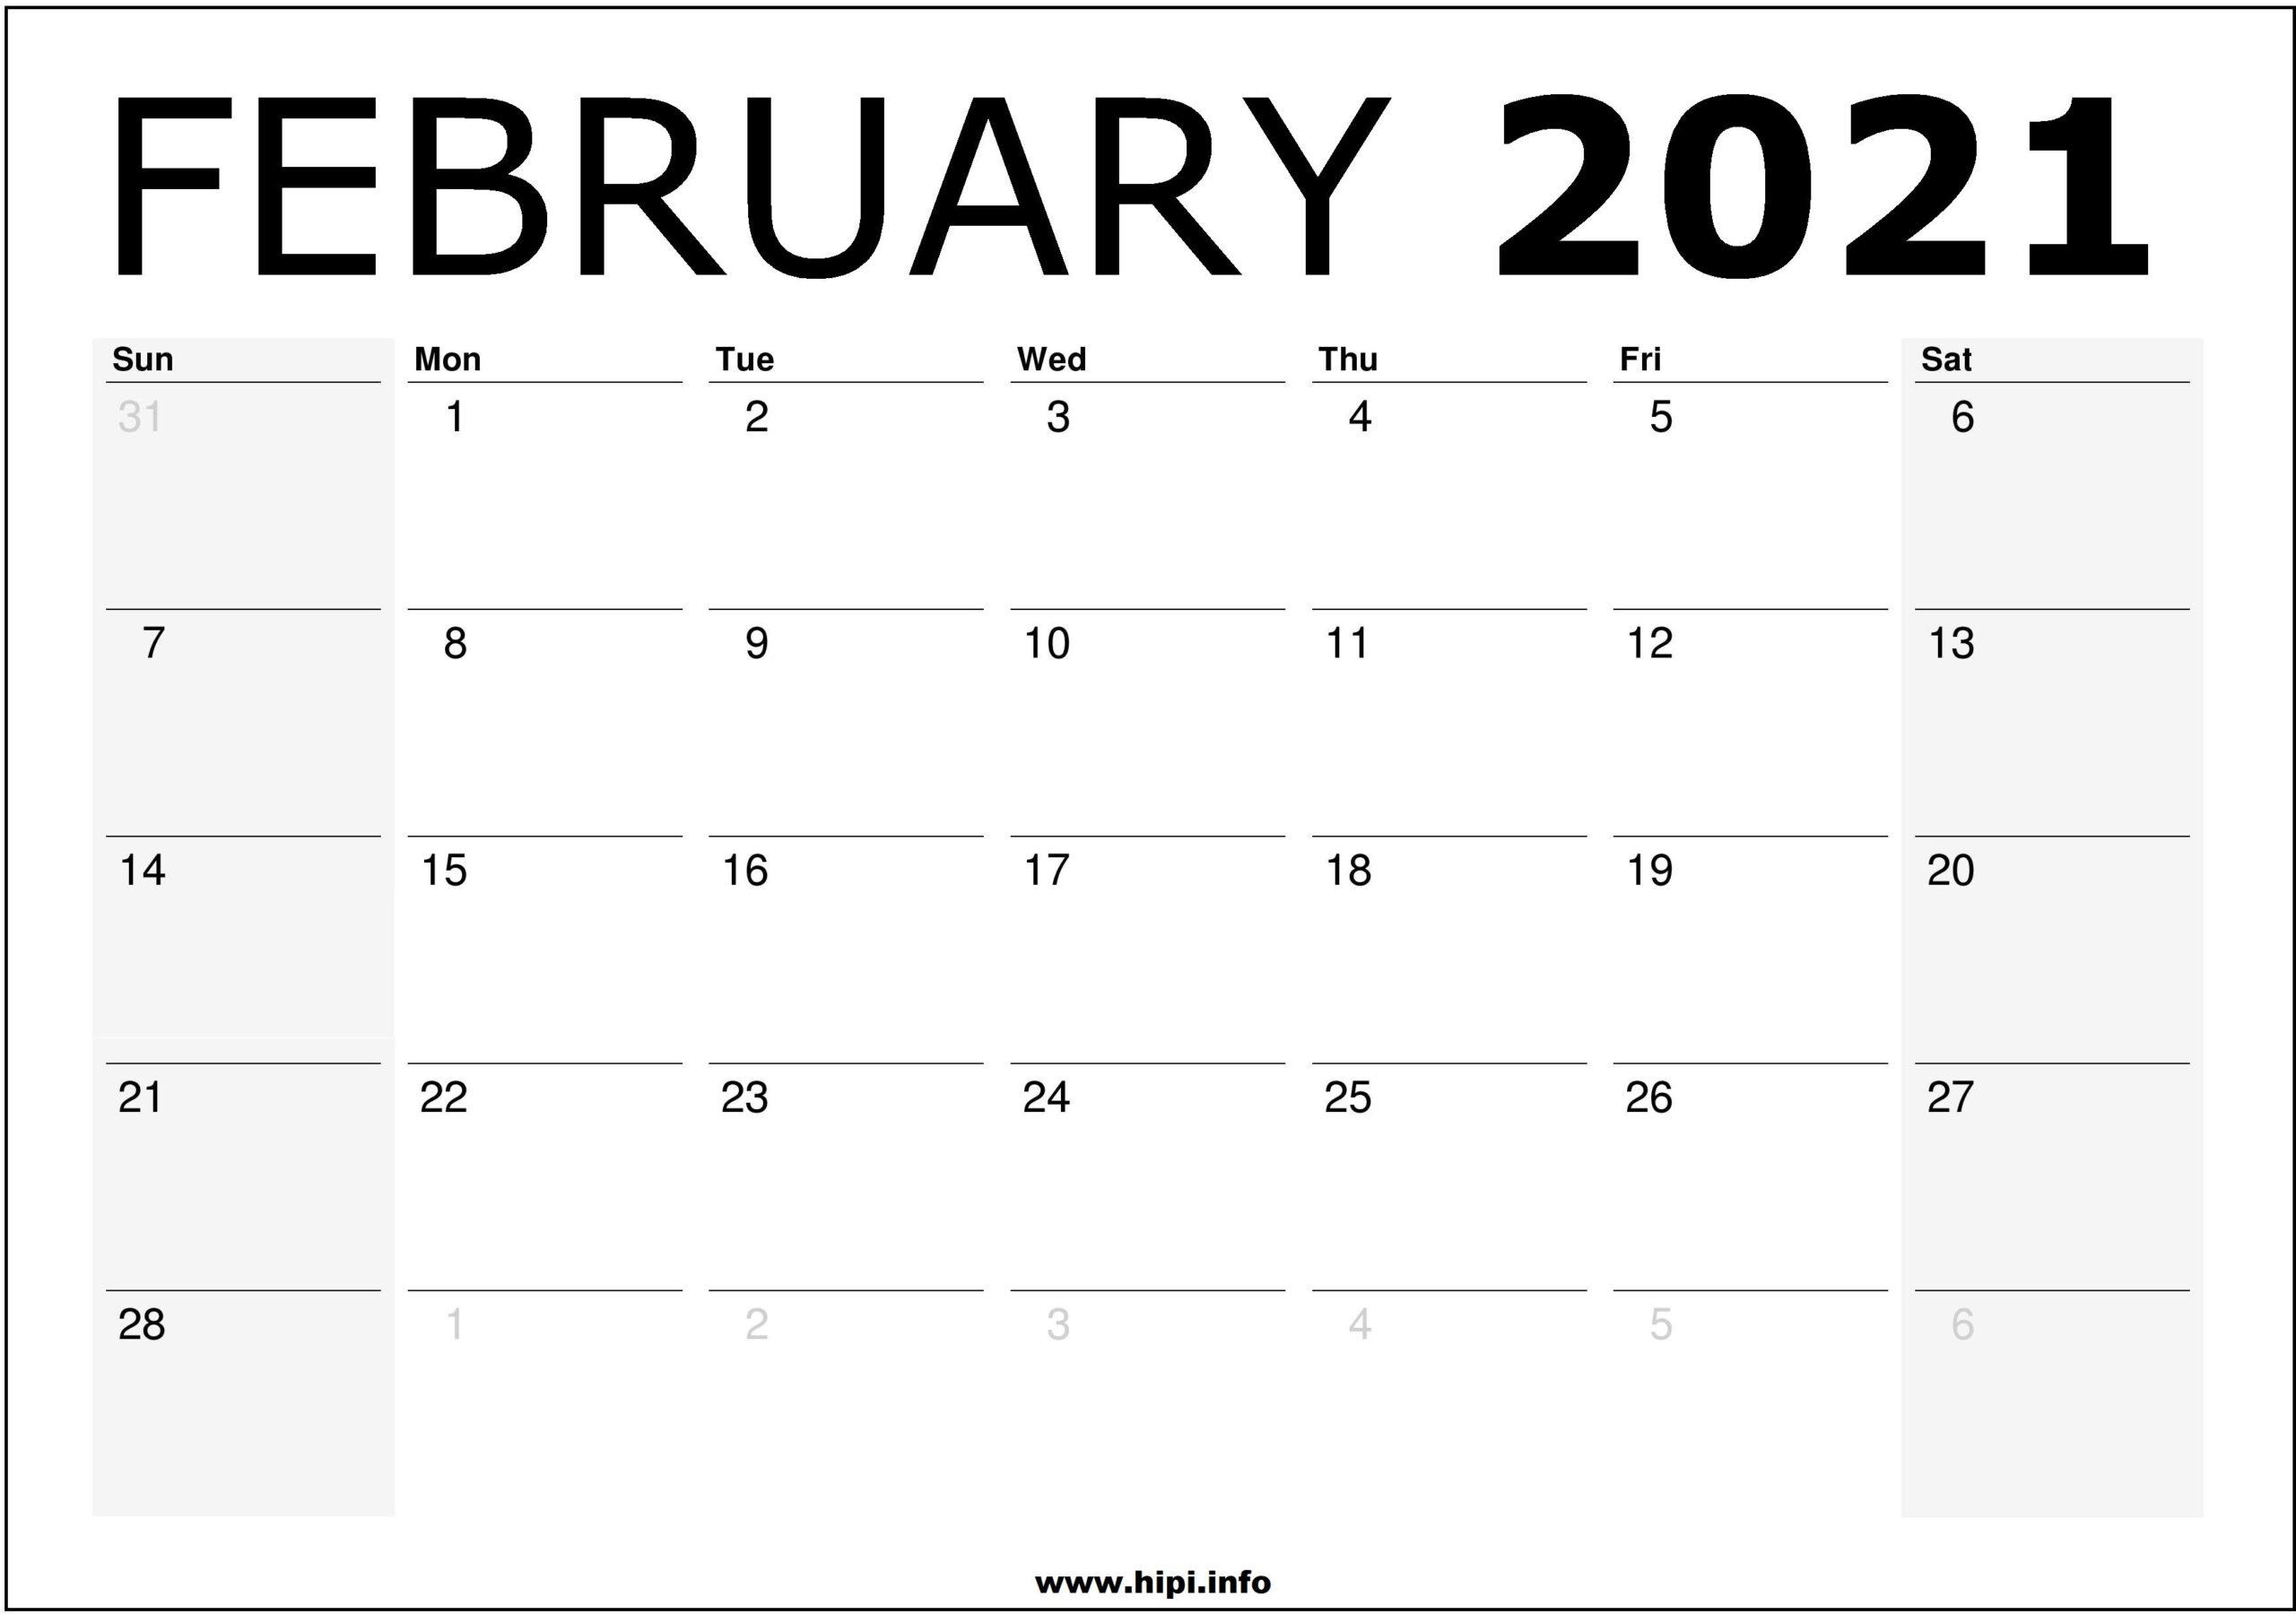 February 2021 Calendar Wallpapers - Top Free February 2021